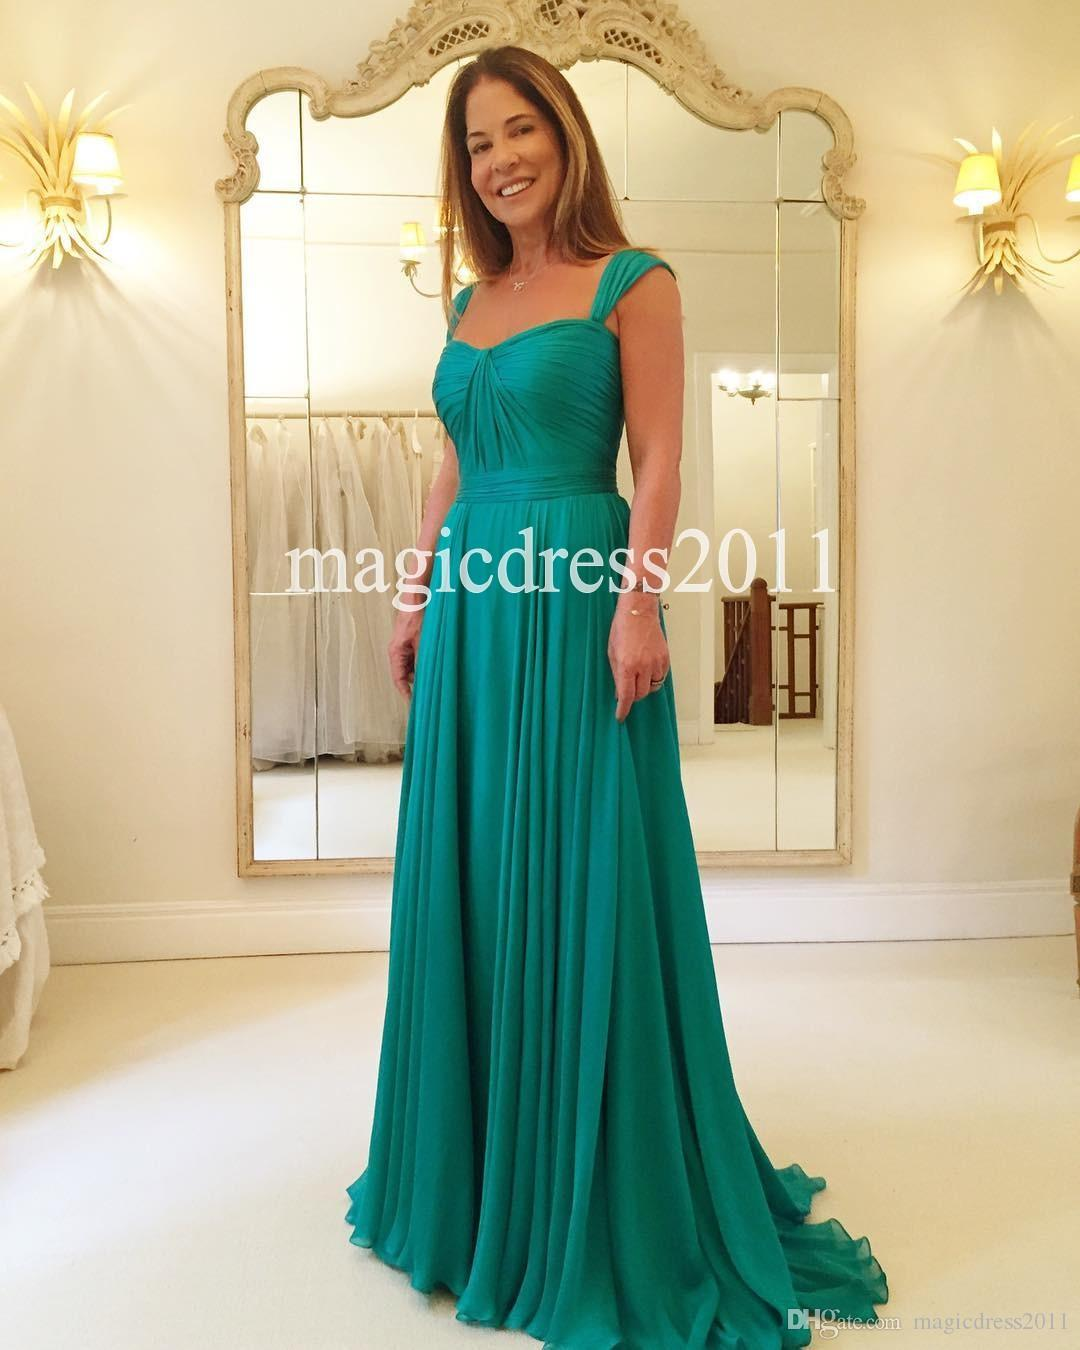 Romantic 2016 Mother Of The Bride Dress Chiffon Beach Wedding